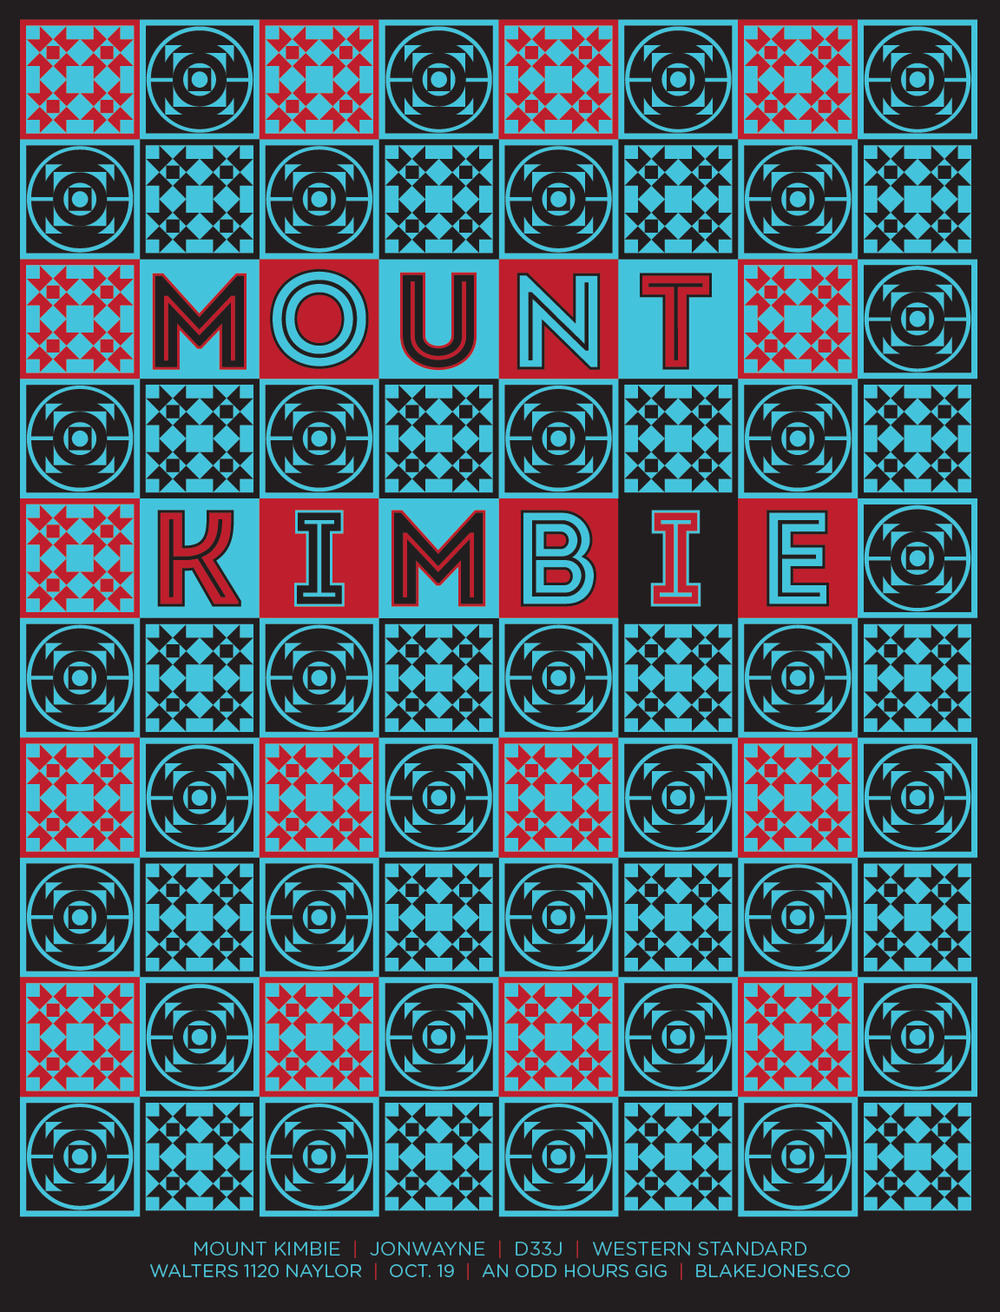 MOUNTKIMBIE-01_23_o.png